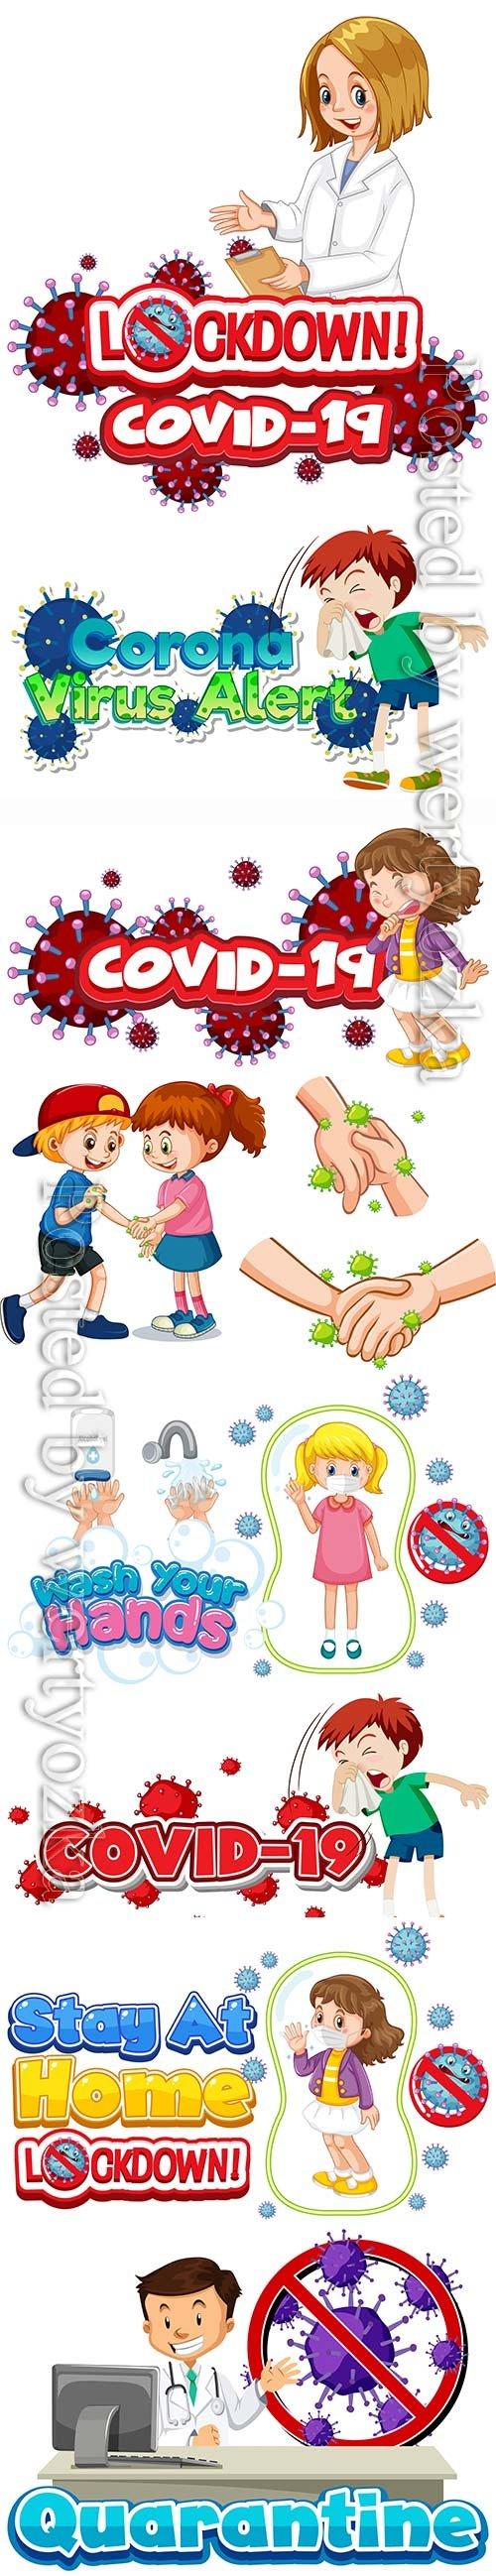 Coronavirus, medicine and people concept vector # 5